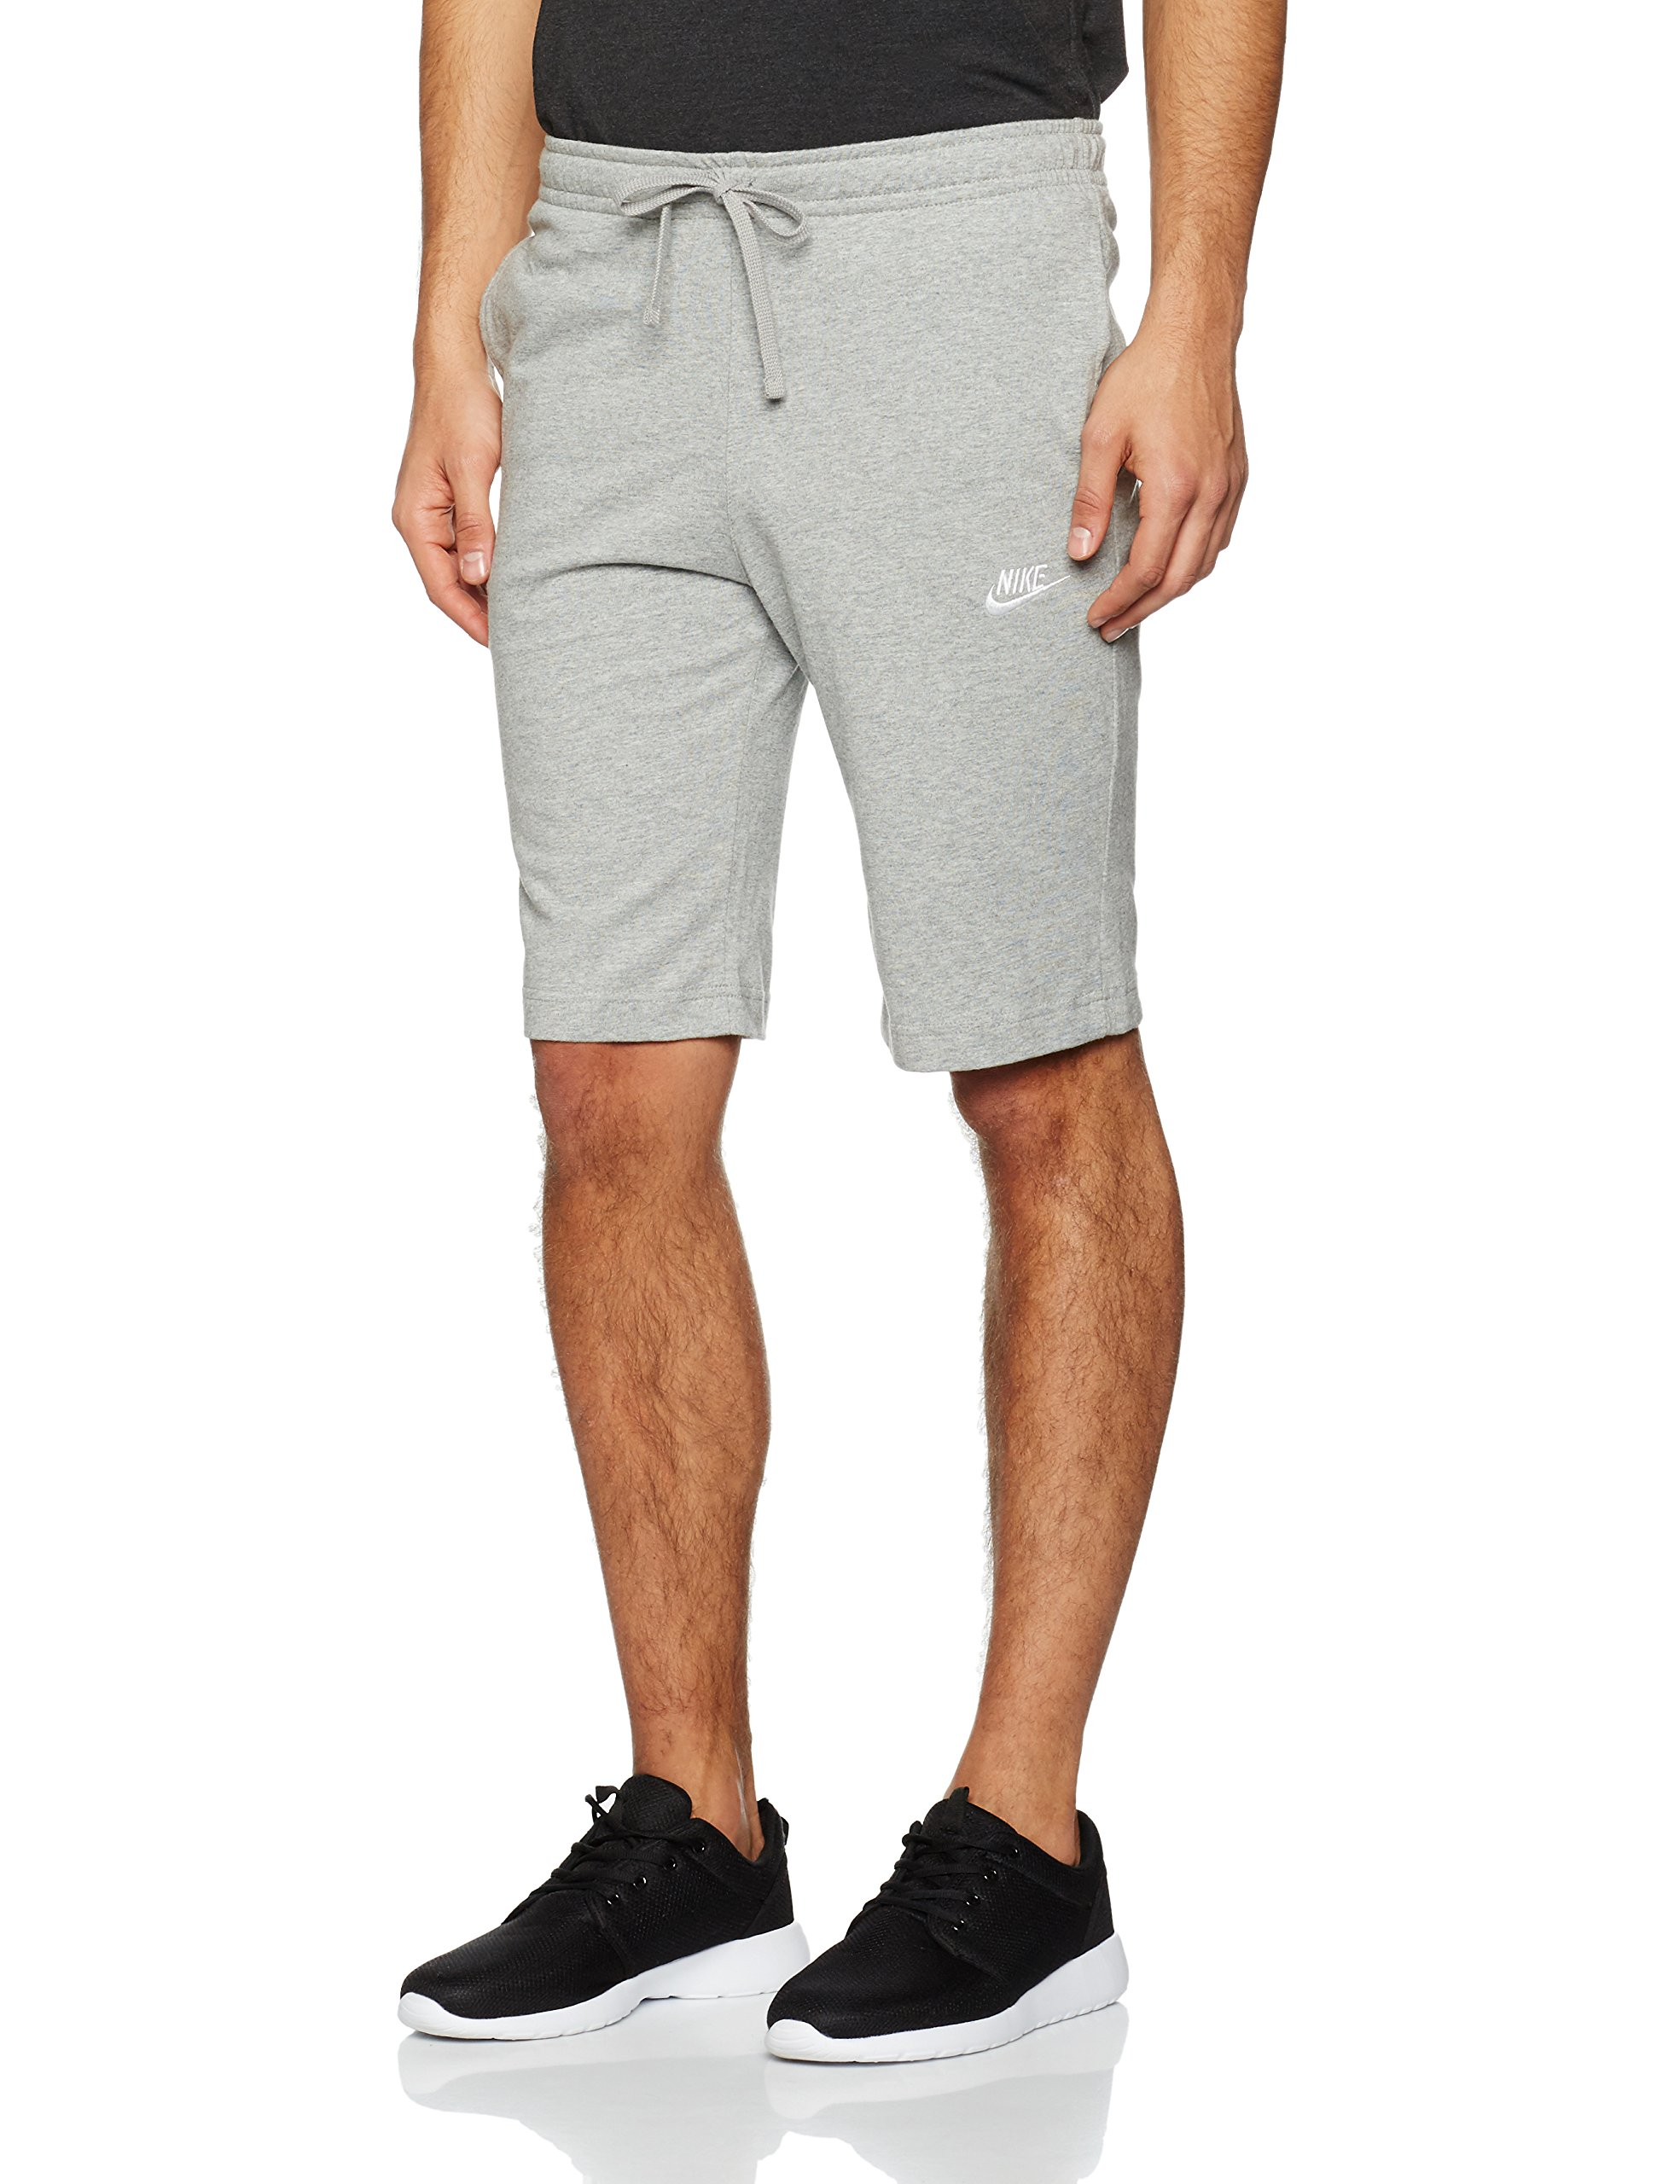 NIKE Sportswear Men's Jersey Club Shorts, Dark Grey Heather/White, Medium